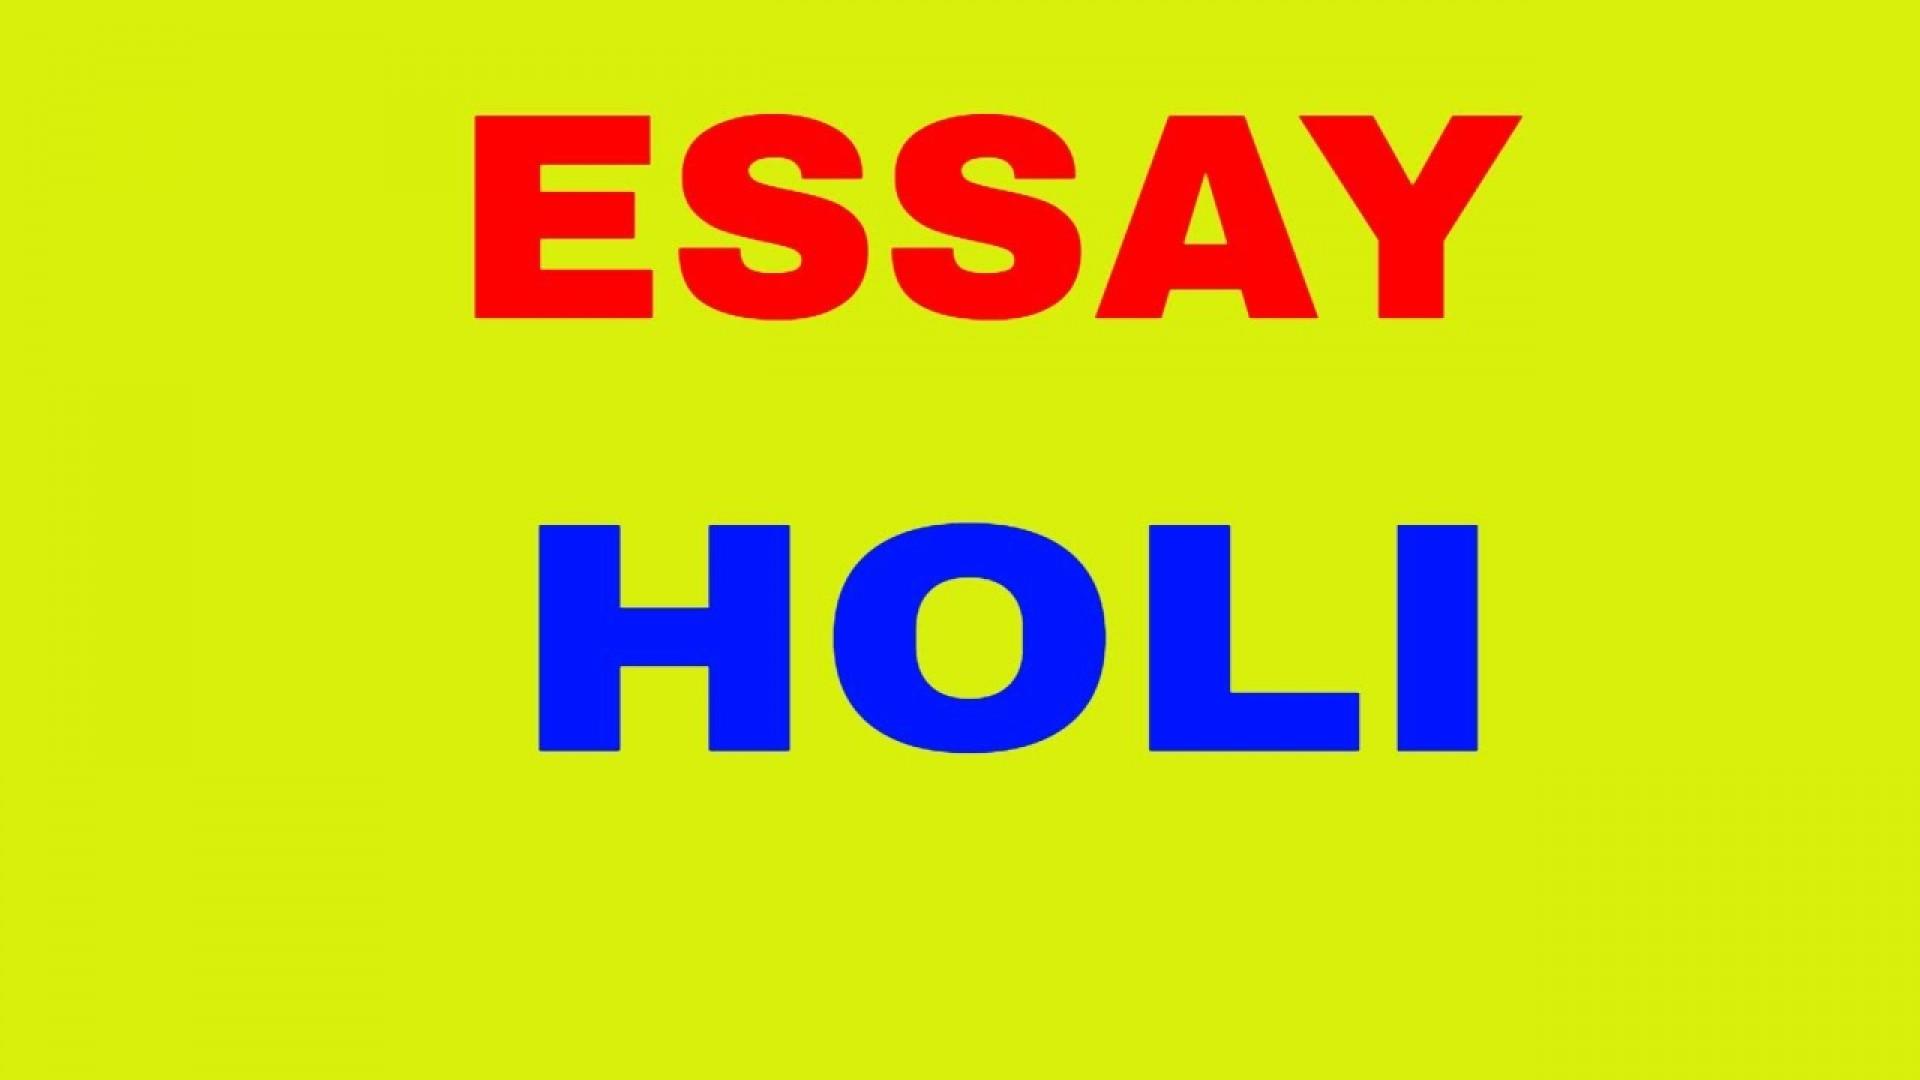 003 Essay Example On Holi Impressive Holidays Are Necessary Evils In Gujarati Festival Punjabi Language 1920